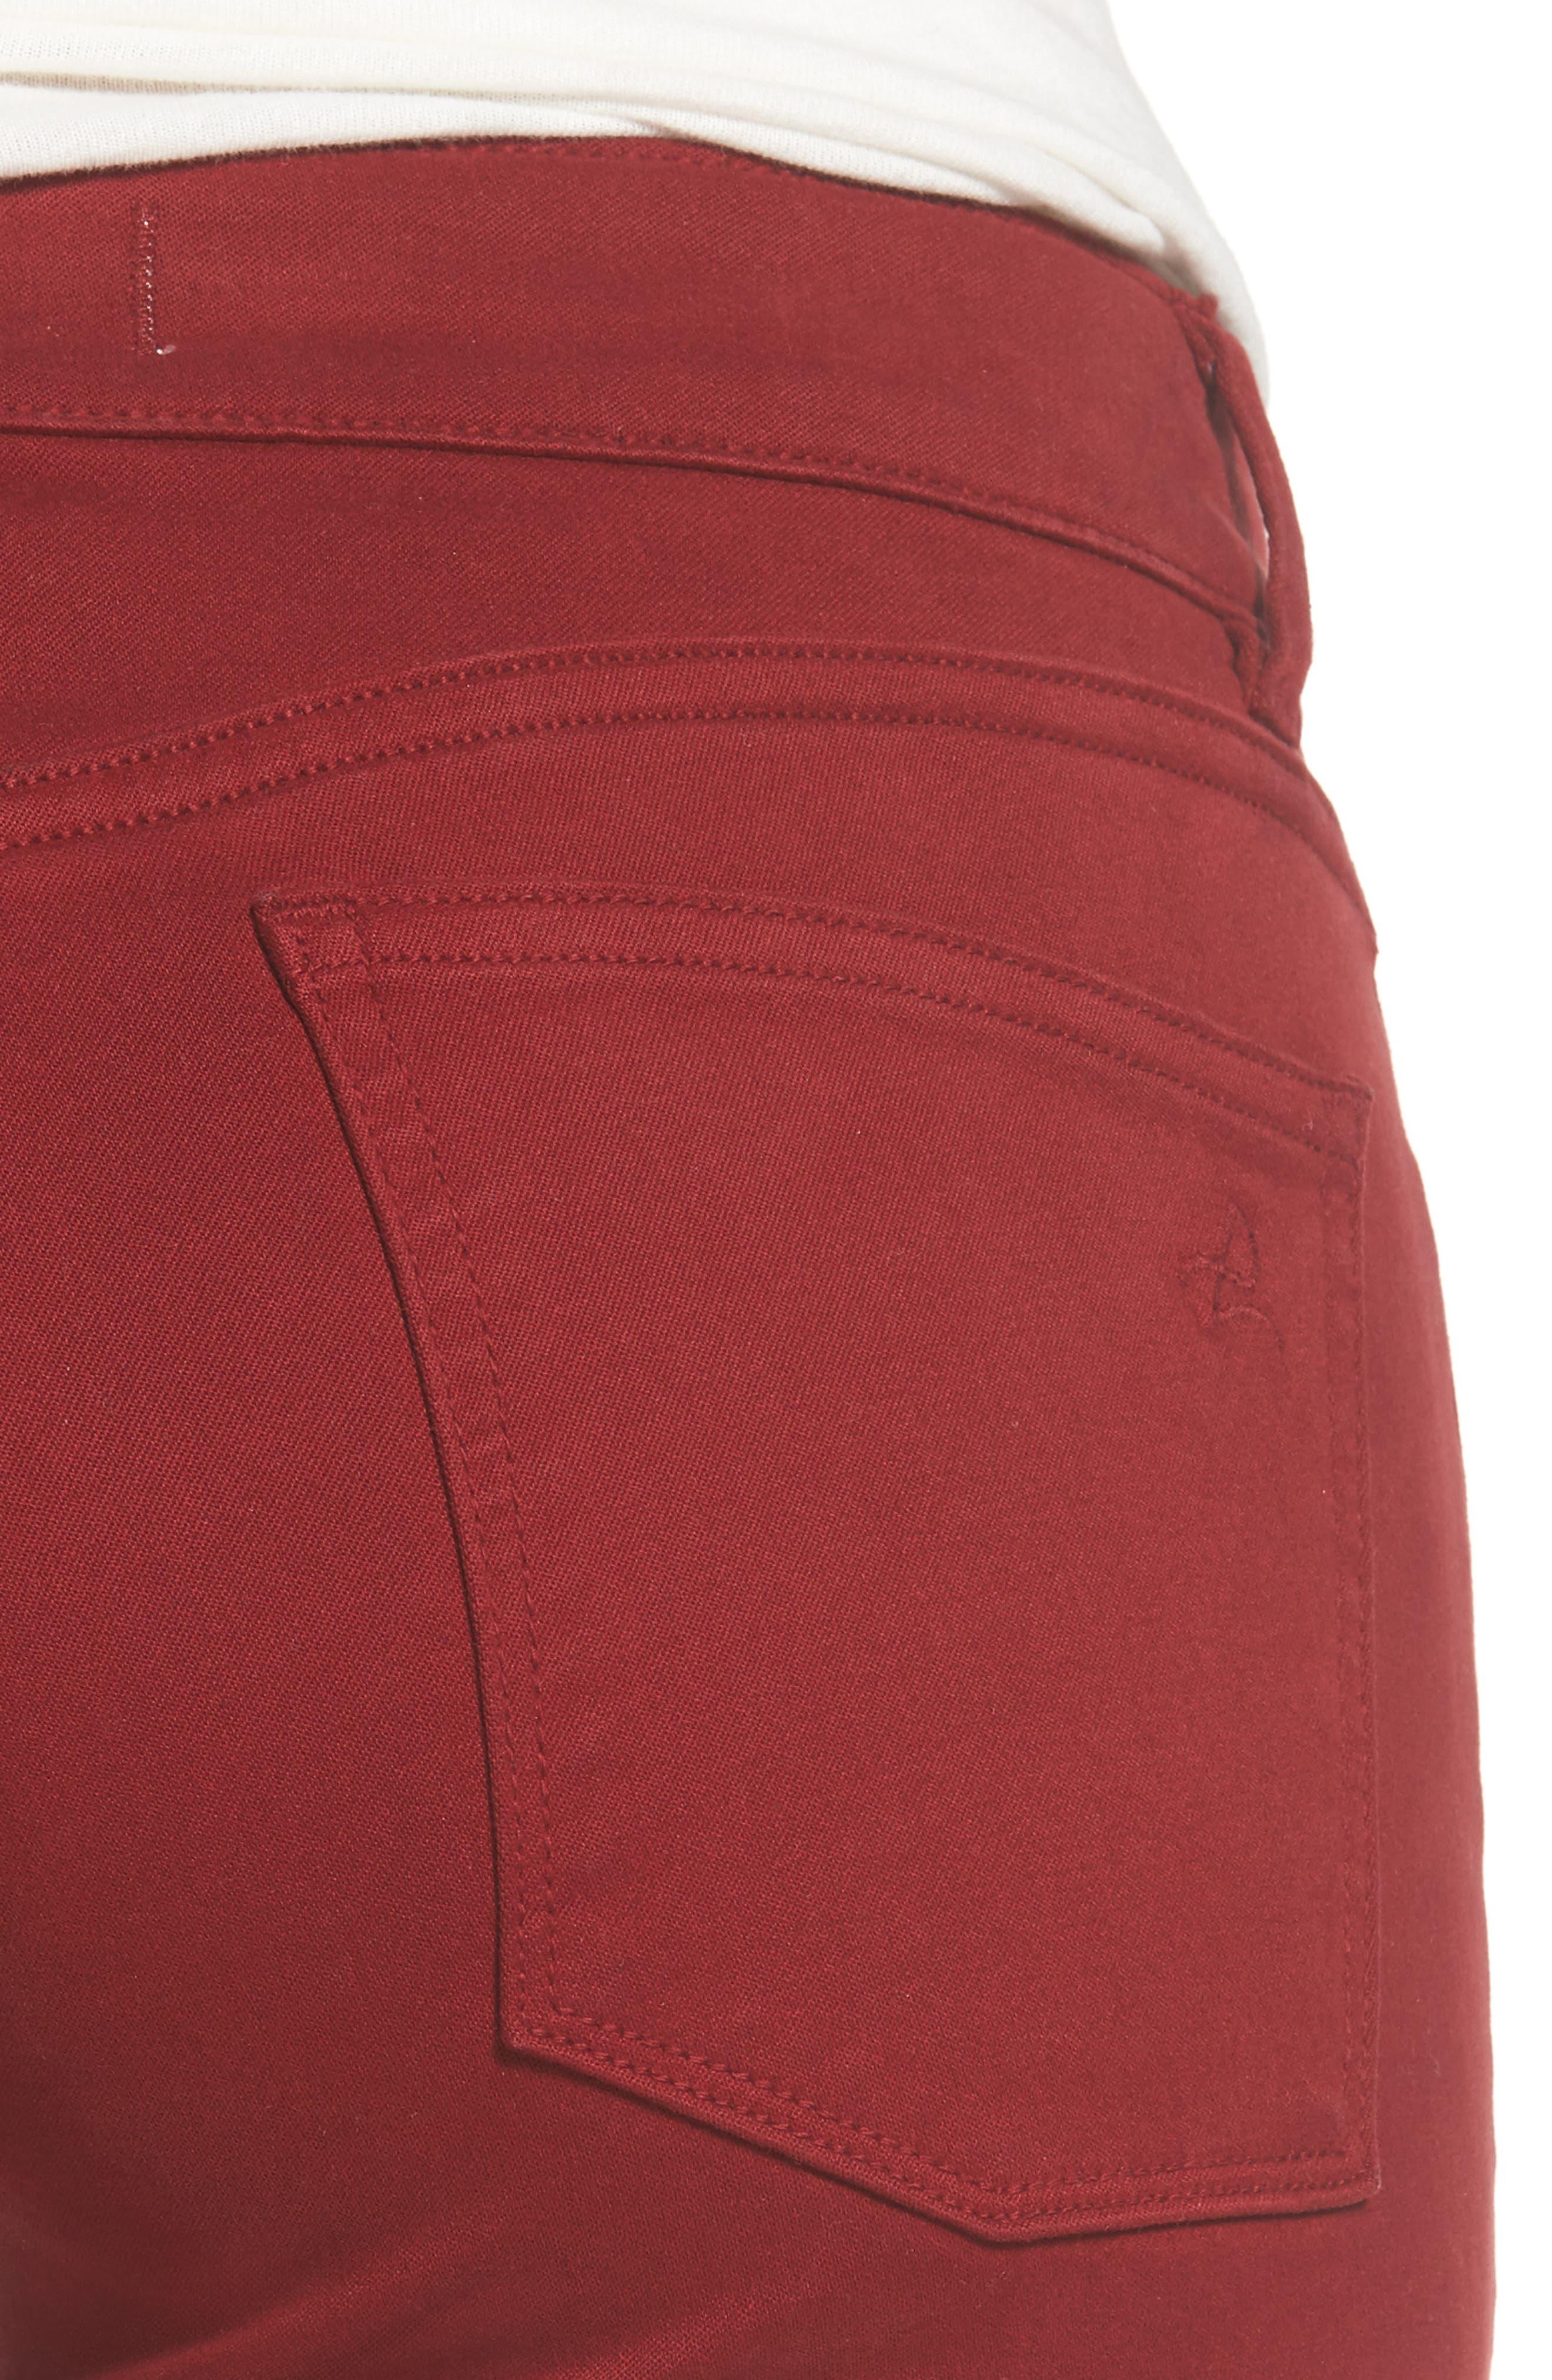 Emma Power Legging Jeans,                             Alternate thumbnail 4, color,                             609